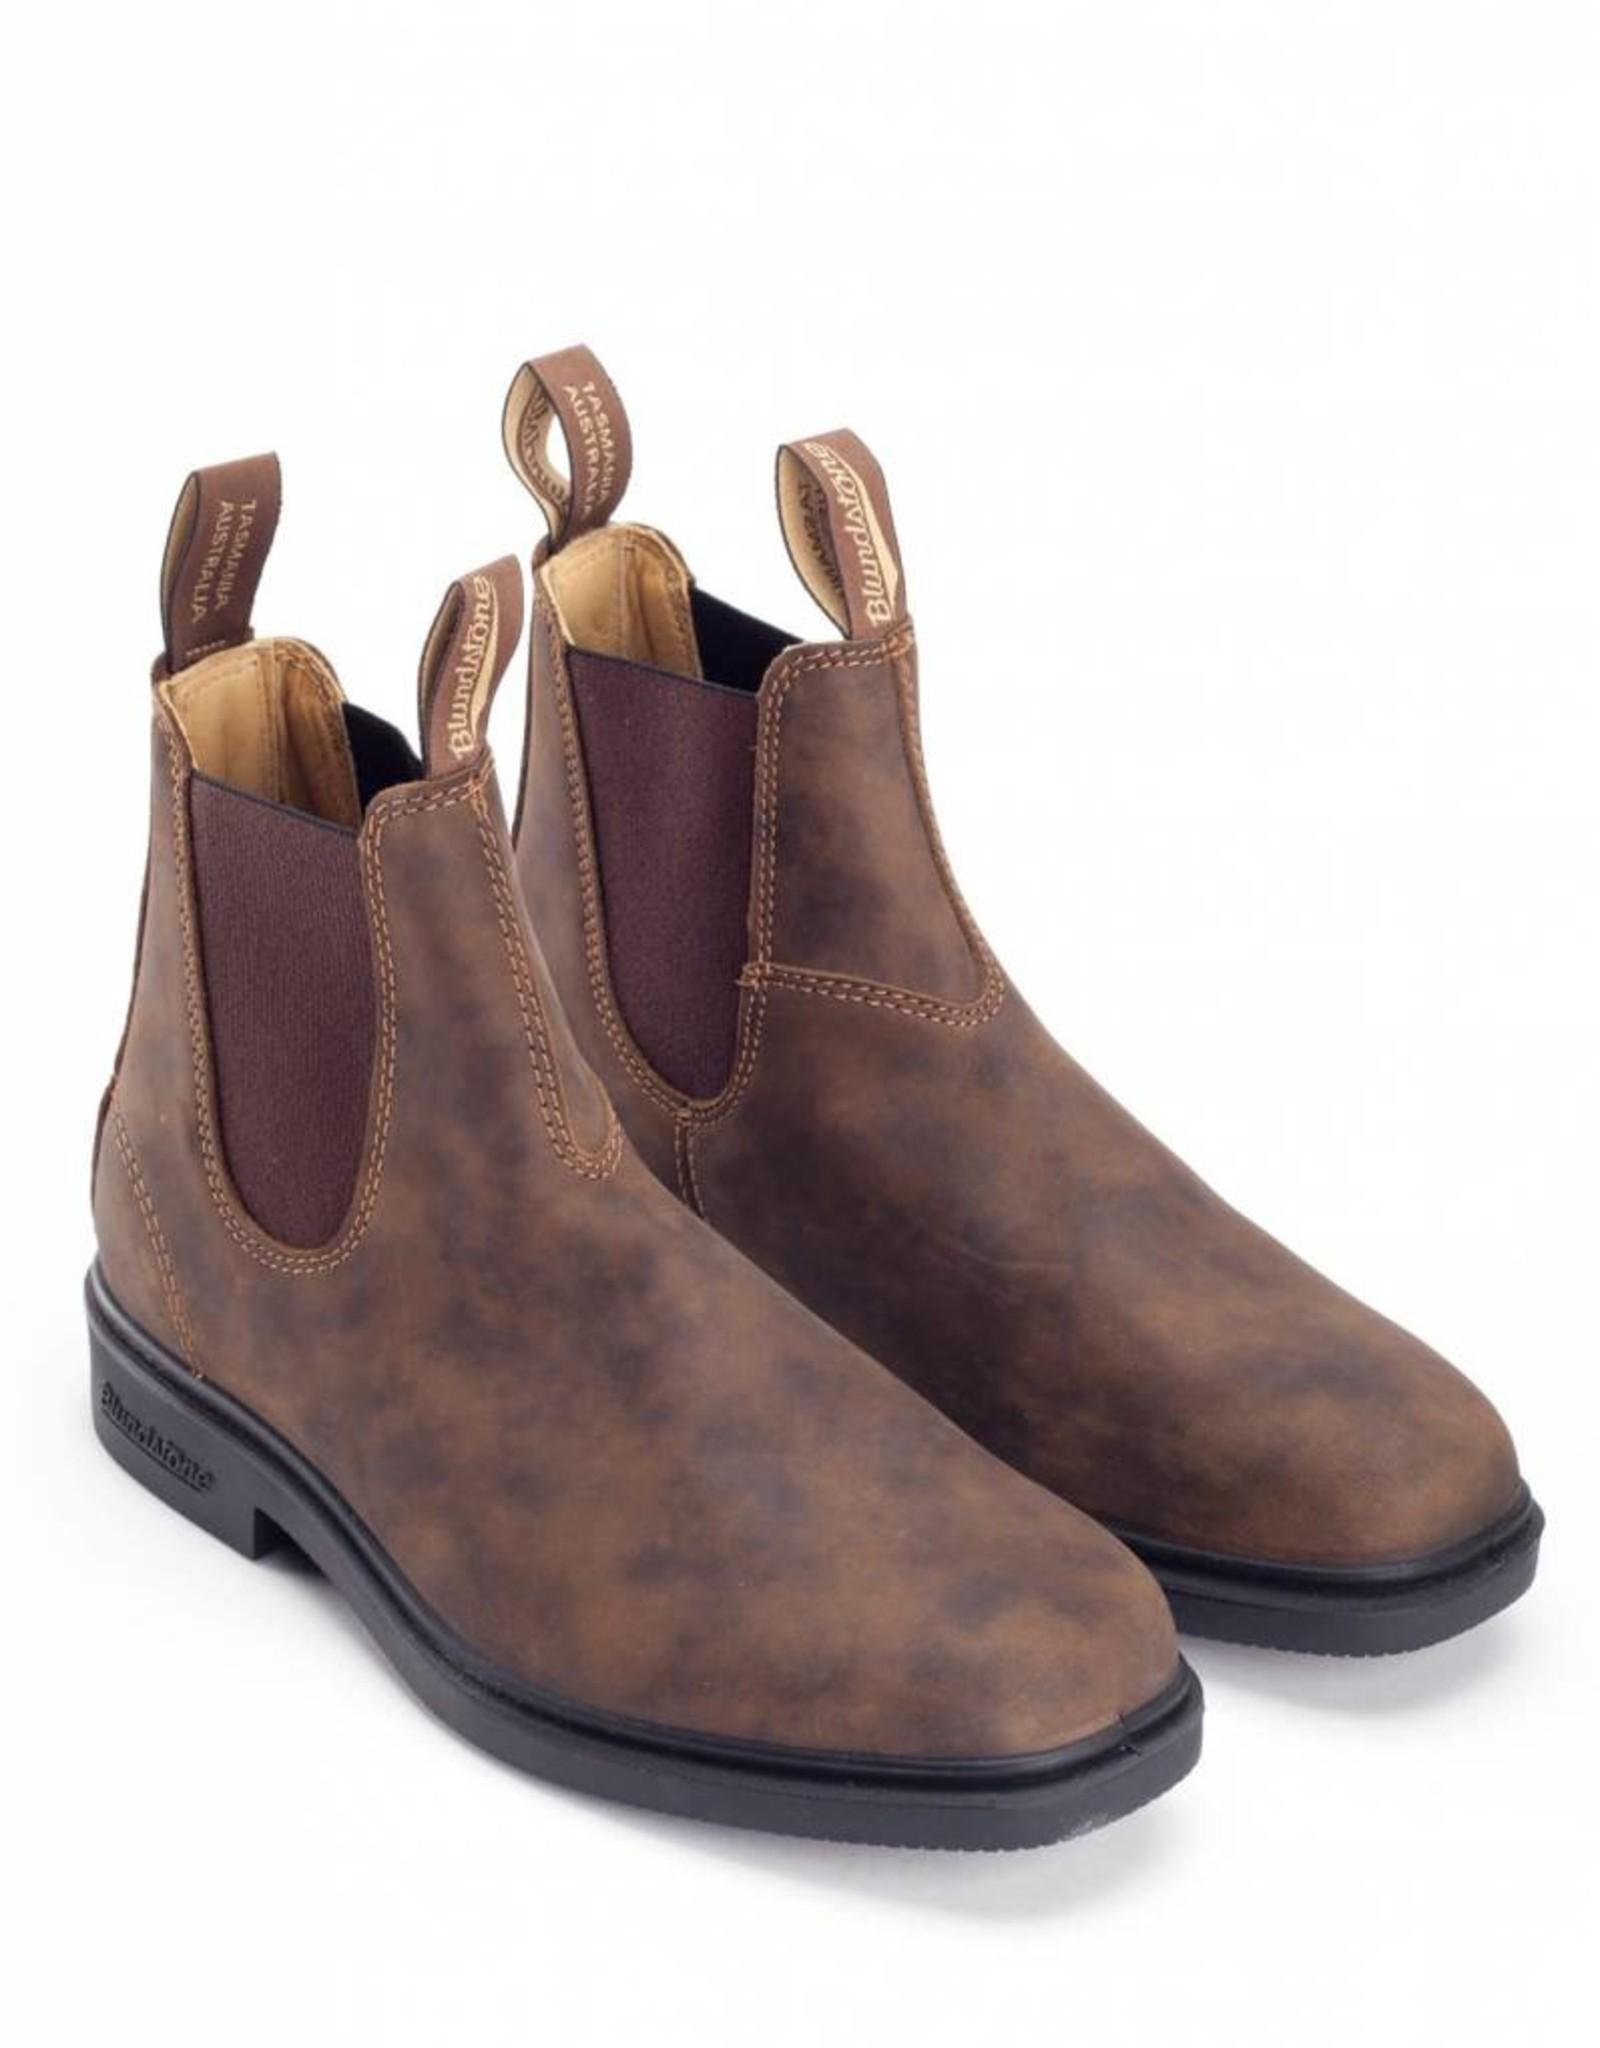 Blundstone Blundstone, Chisel Toe Rustic Brown 1306, , 1WIDTH, 7.5